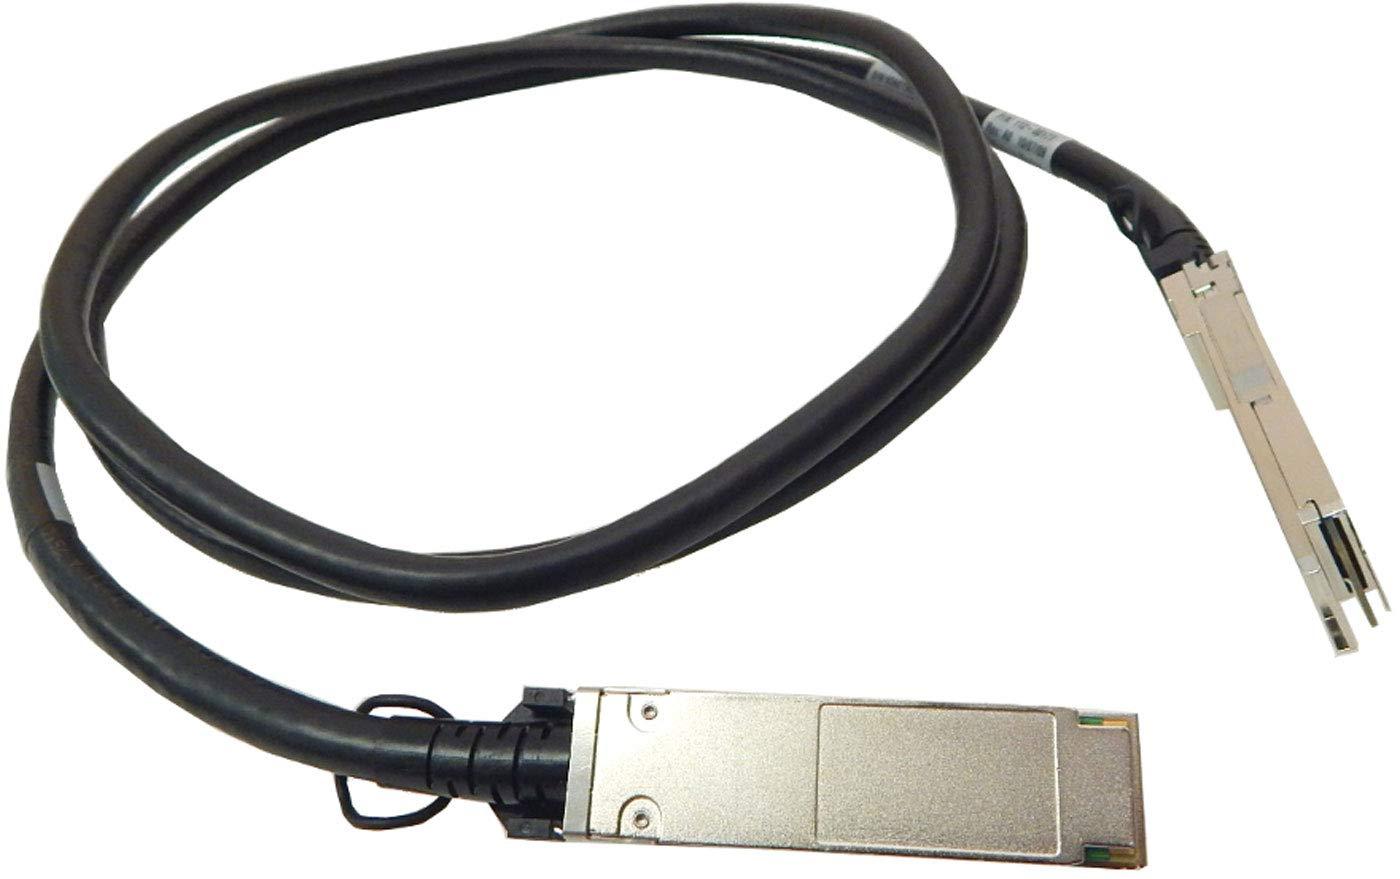 NetApp X6559-R6 External SAS Cable QSFP-QSFP 112-00178 5 Meter